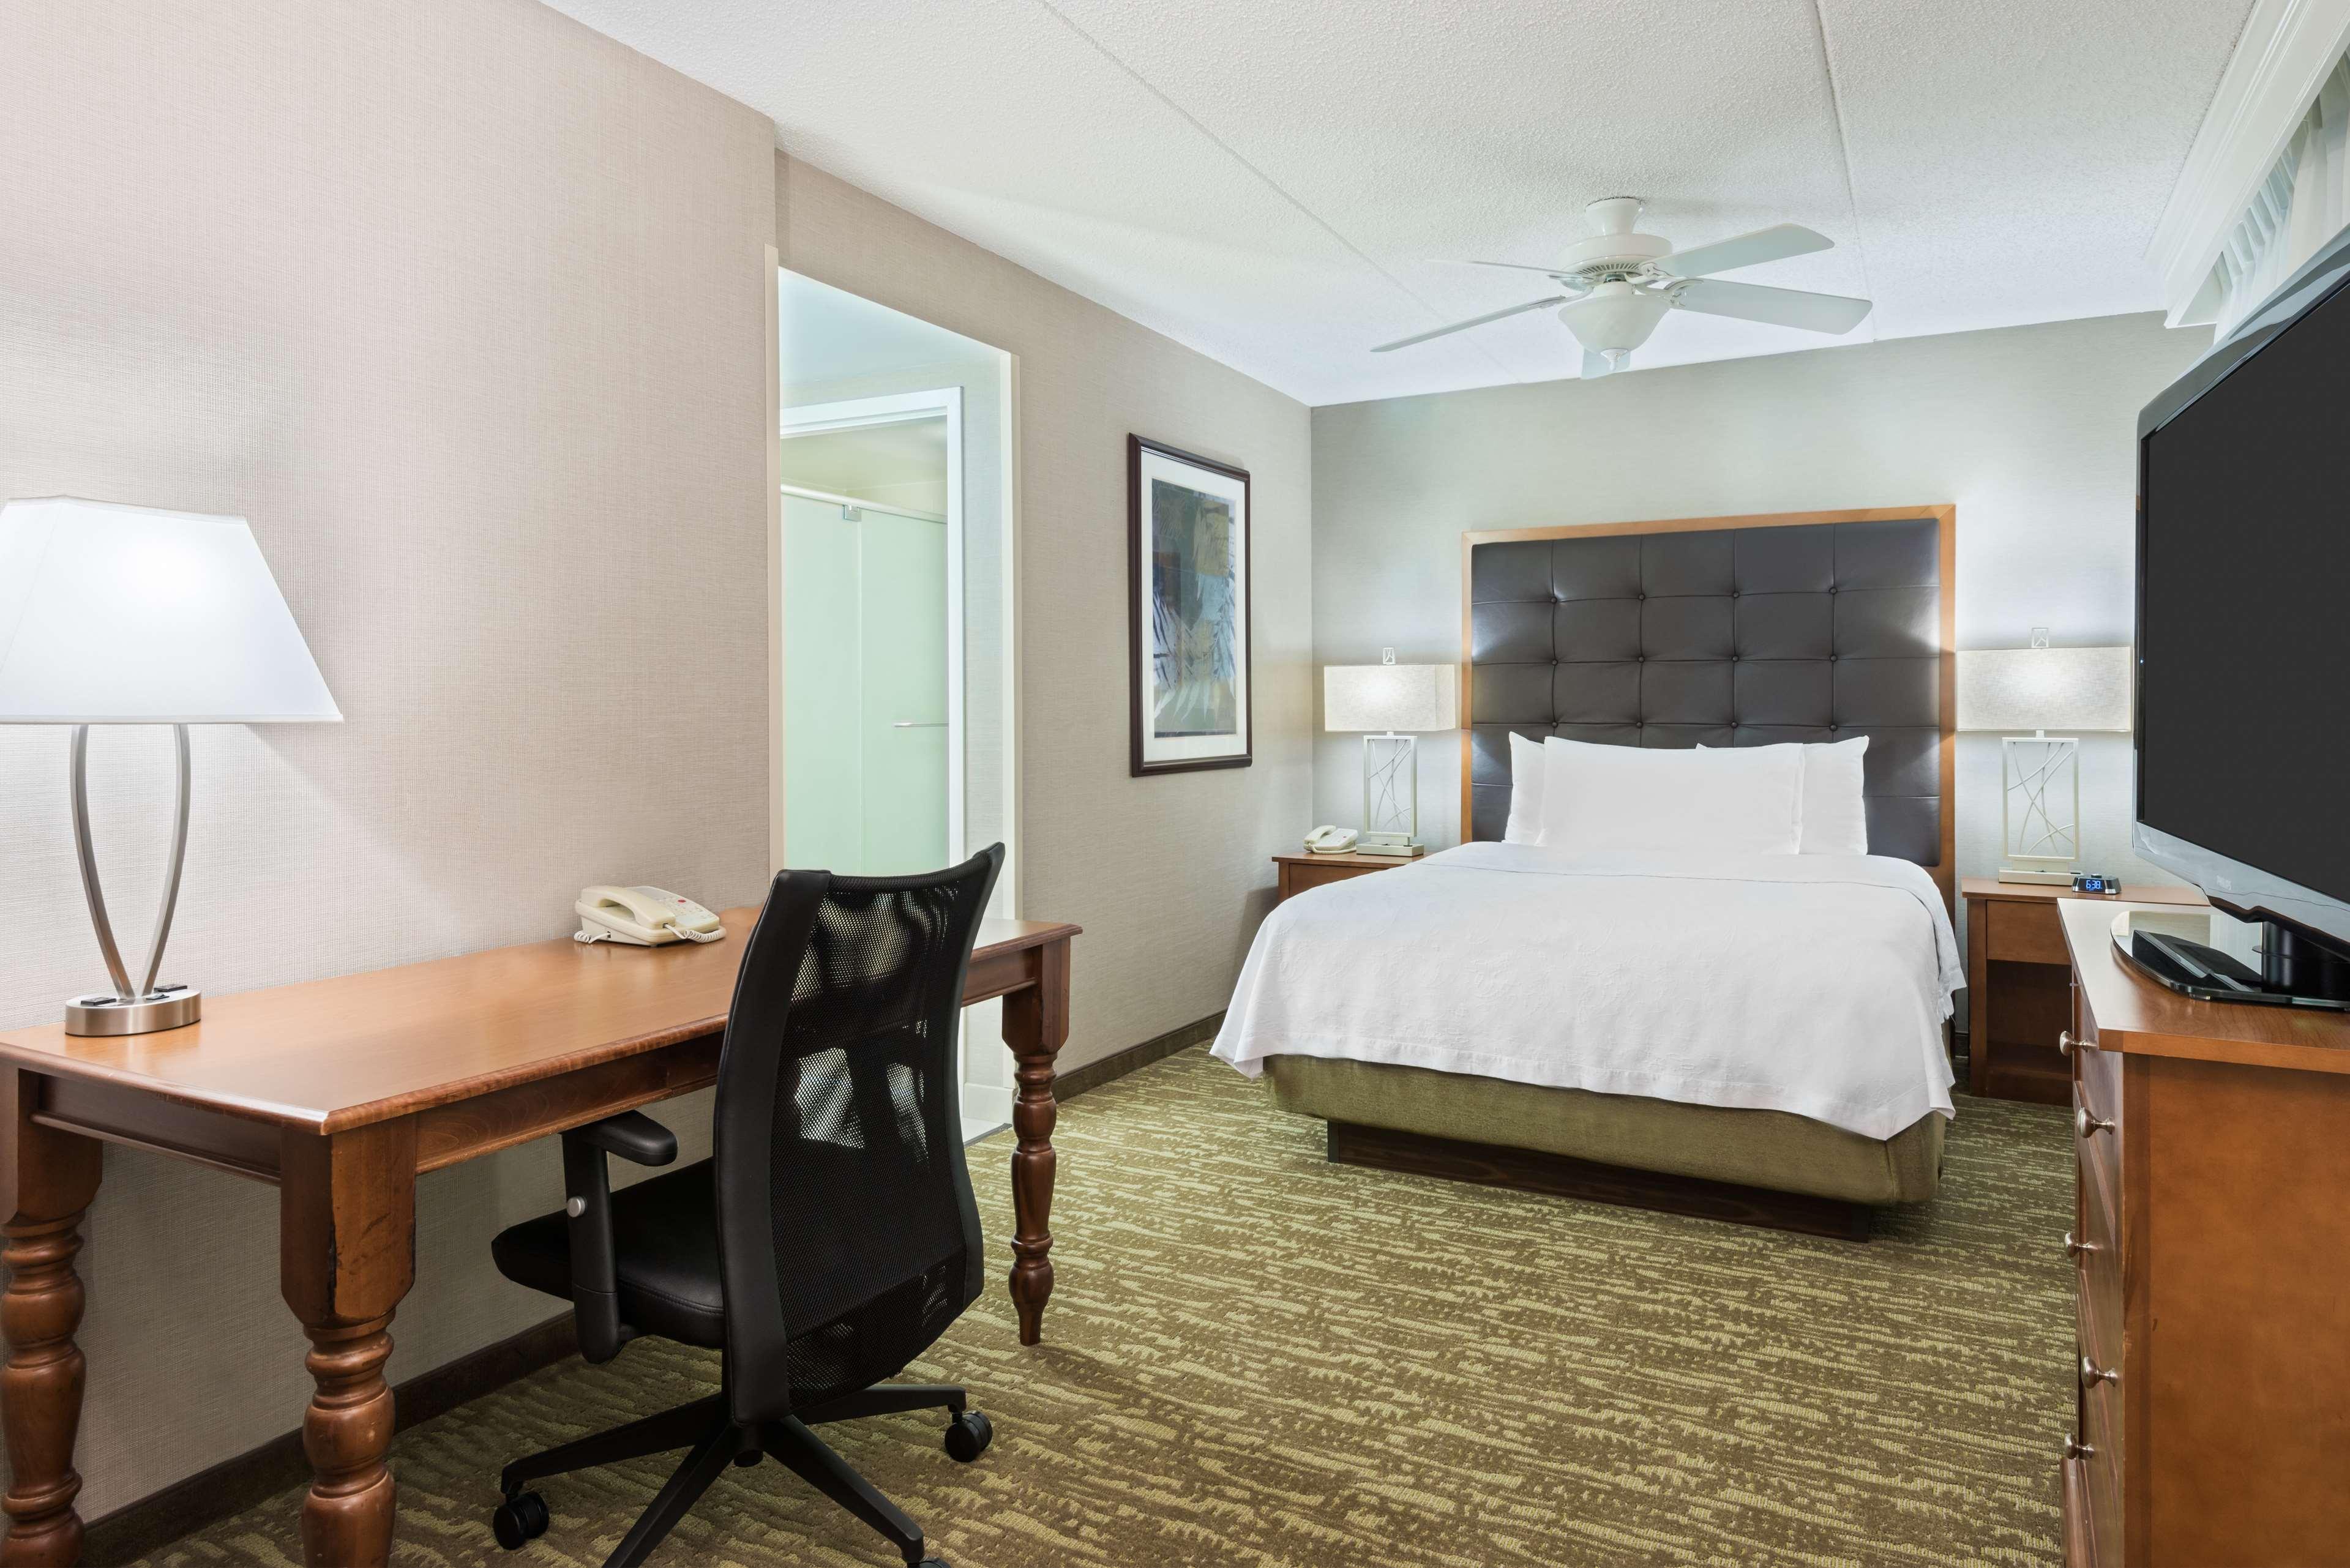 Homewood Suites by Hilton Holyoke-Springfield/North image 16